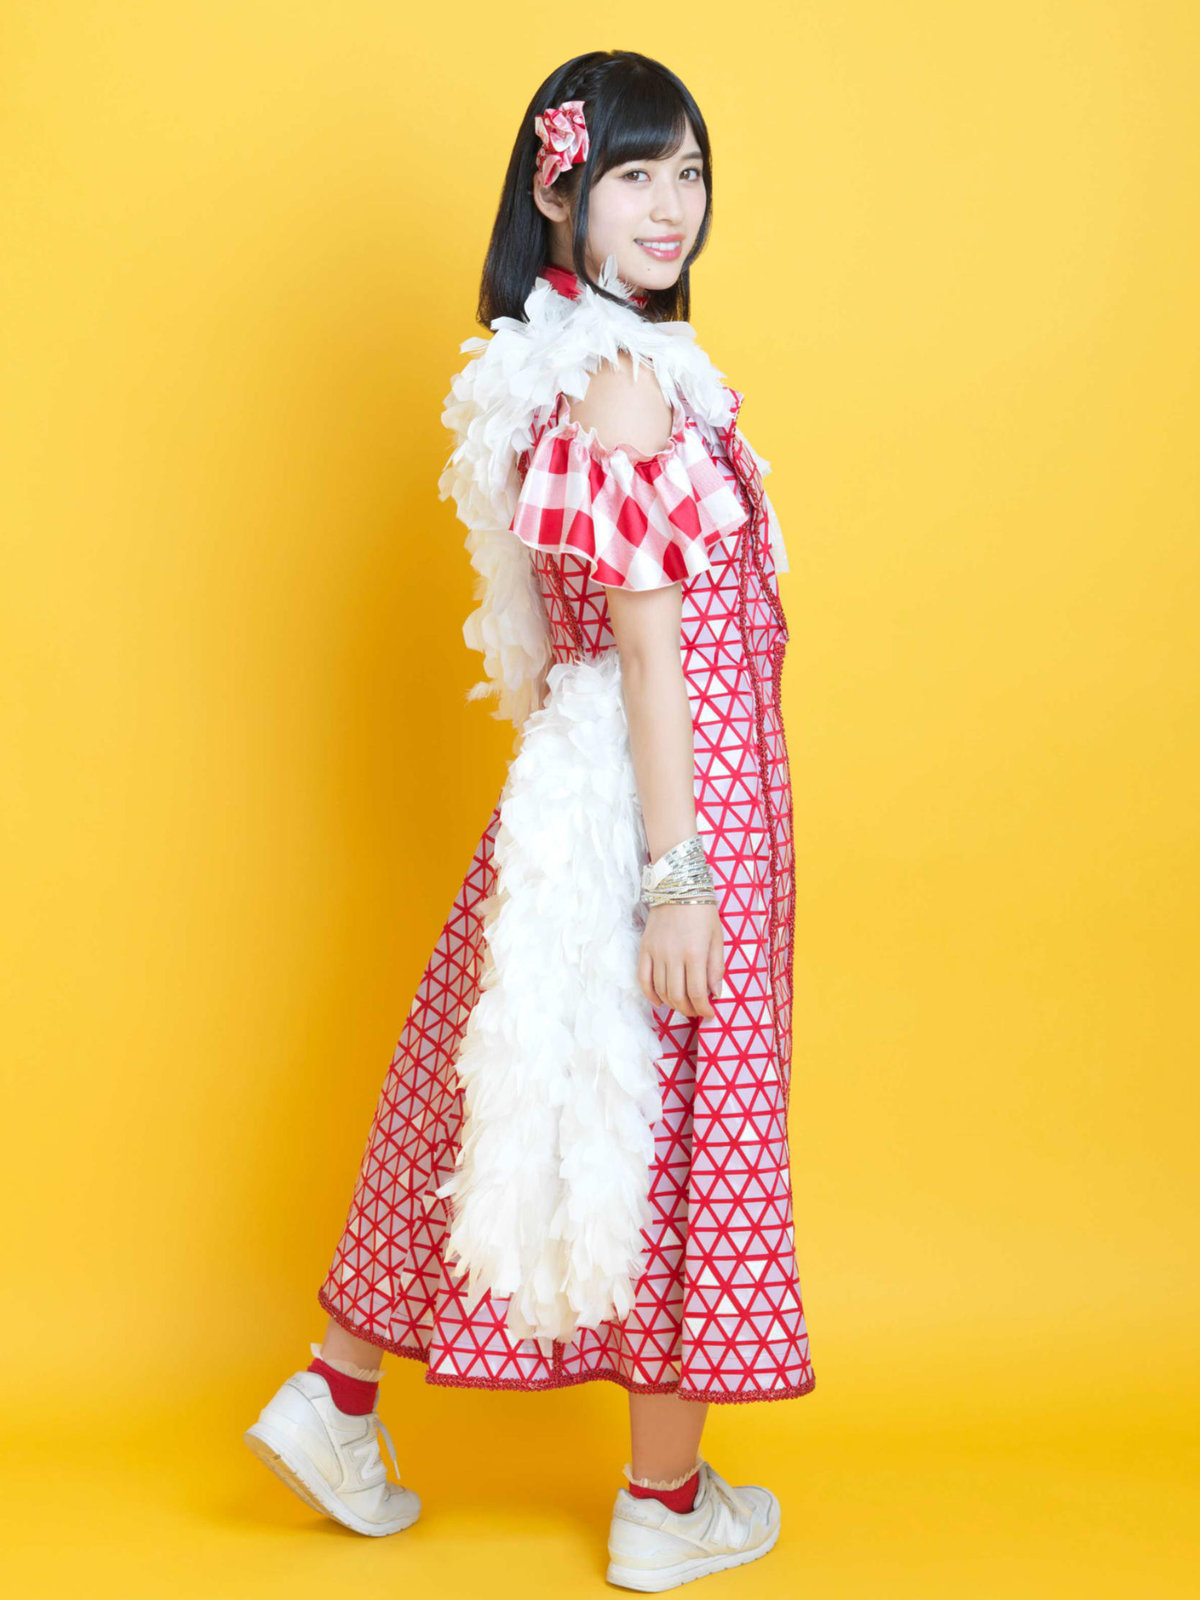 Magazine, Sengoku Minami, Up Up Girls (Kari)